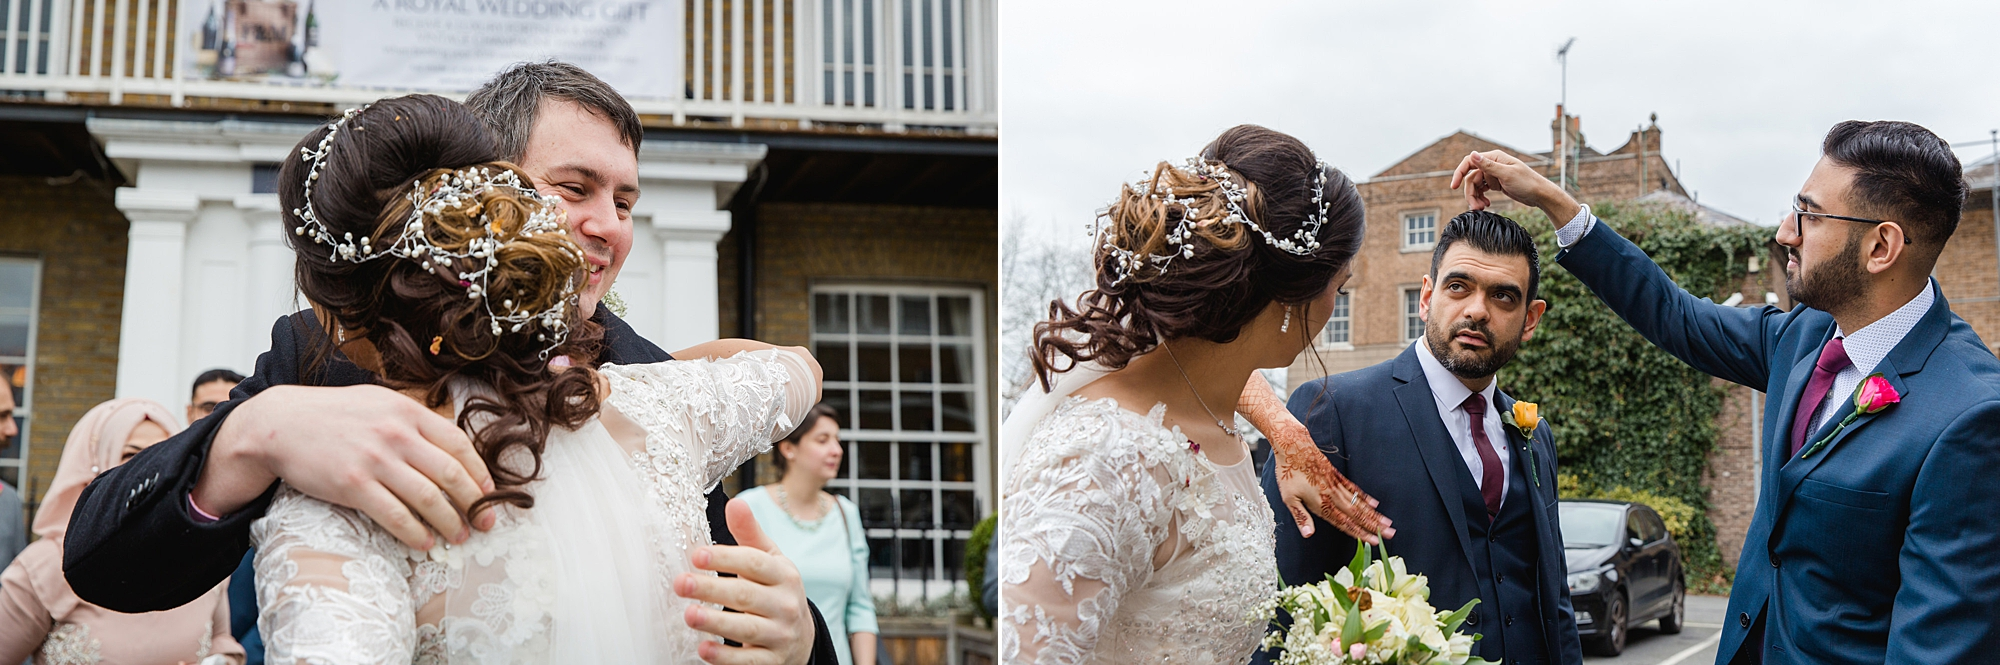 Richmond Hill Hotel wedding photography bride brushing confetti off groom